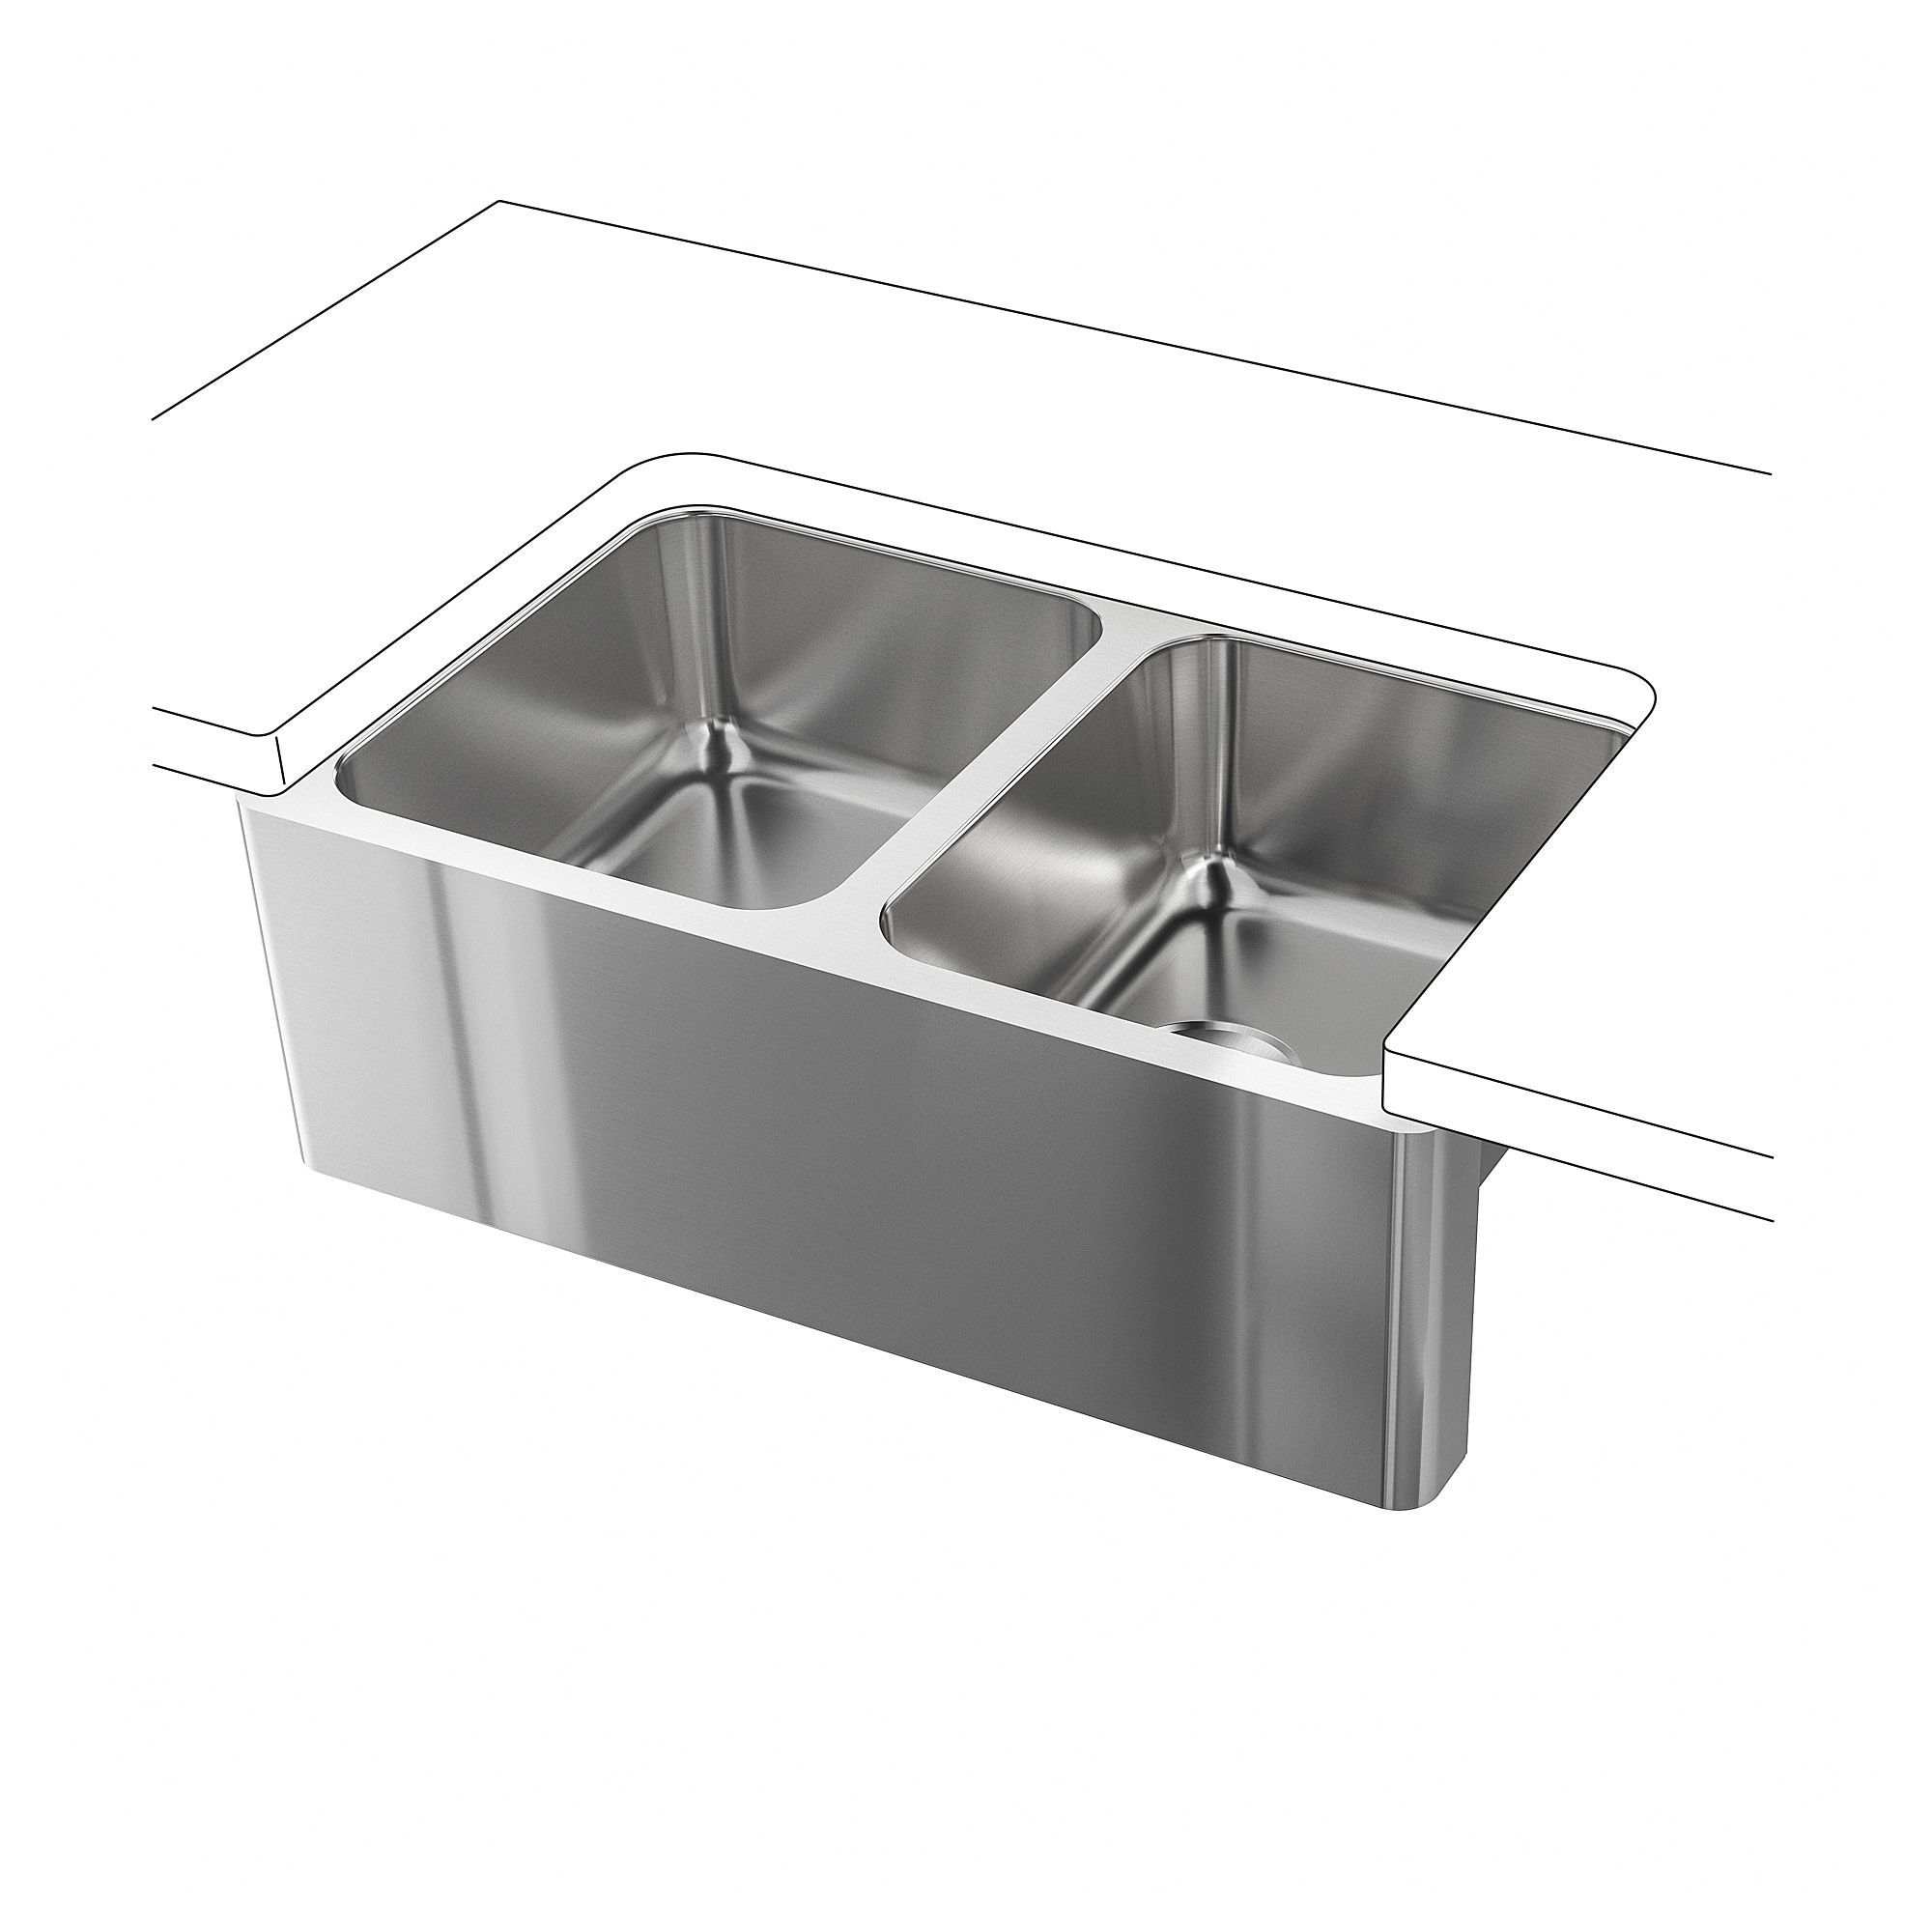 bredsj n apron front double bowl sink under glued stainless steel rh pinterest ca